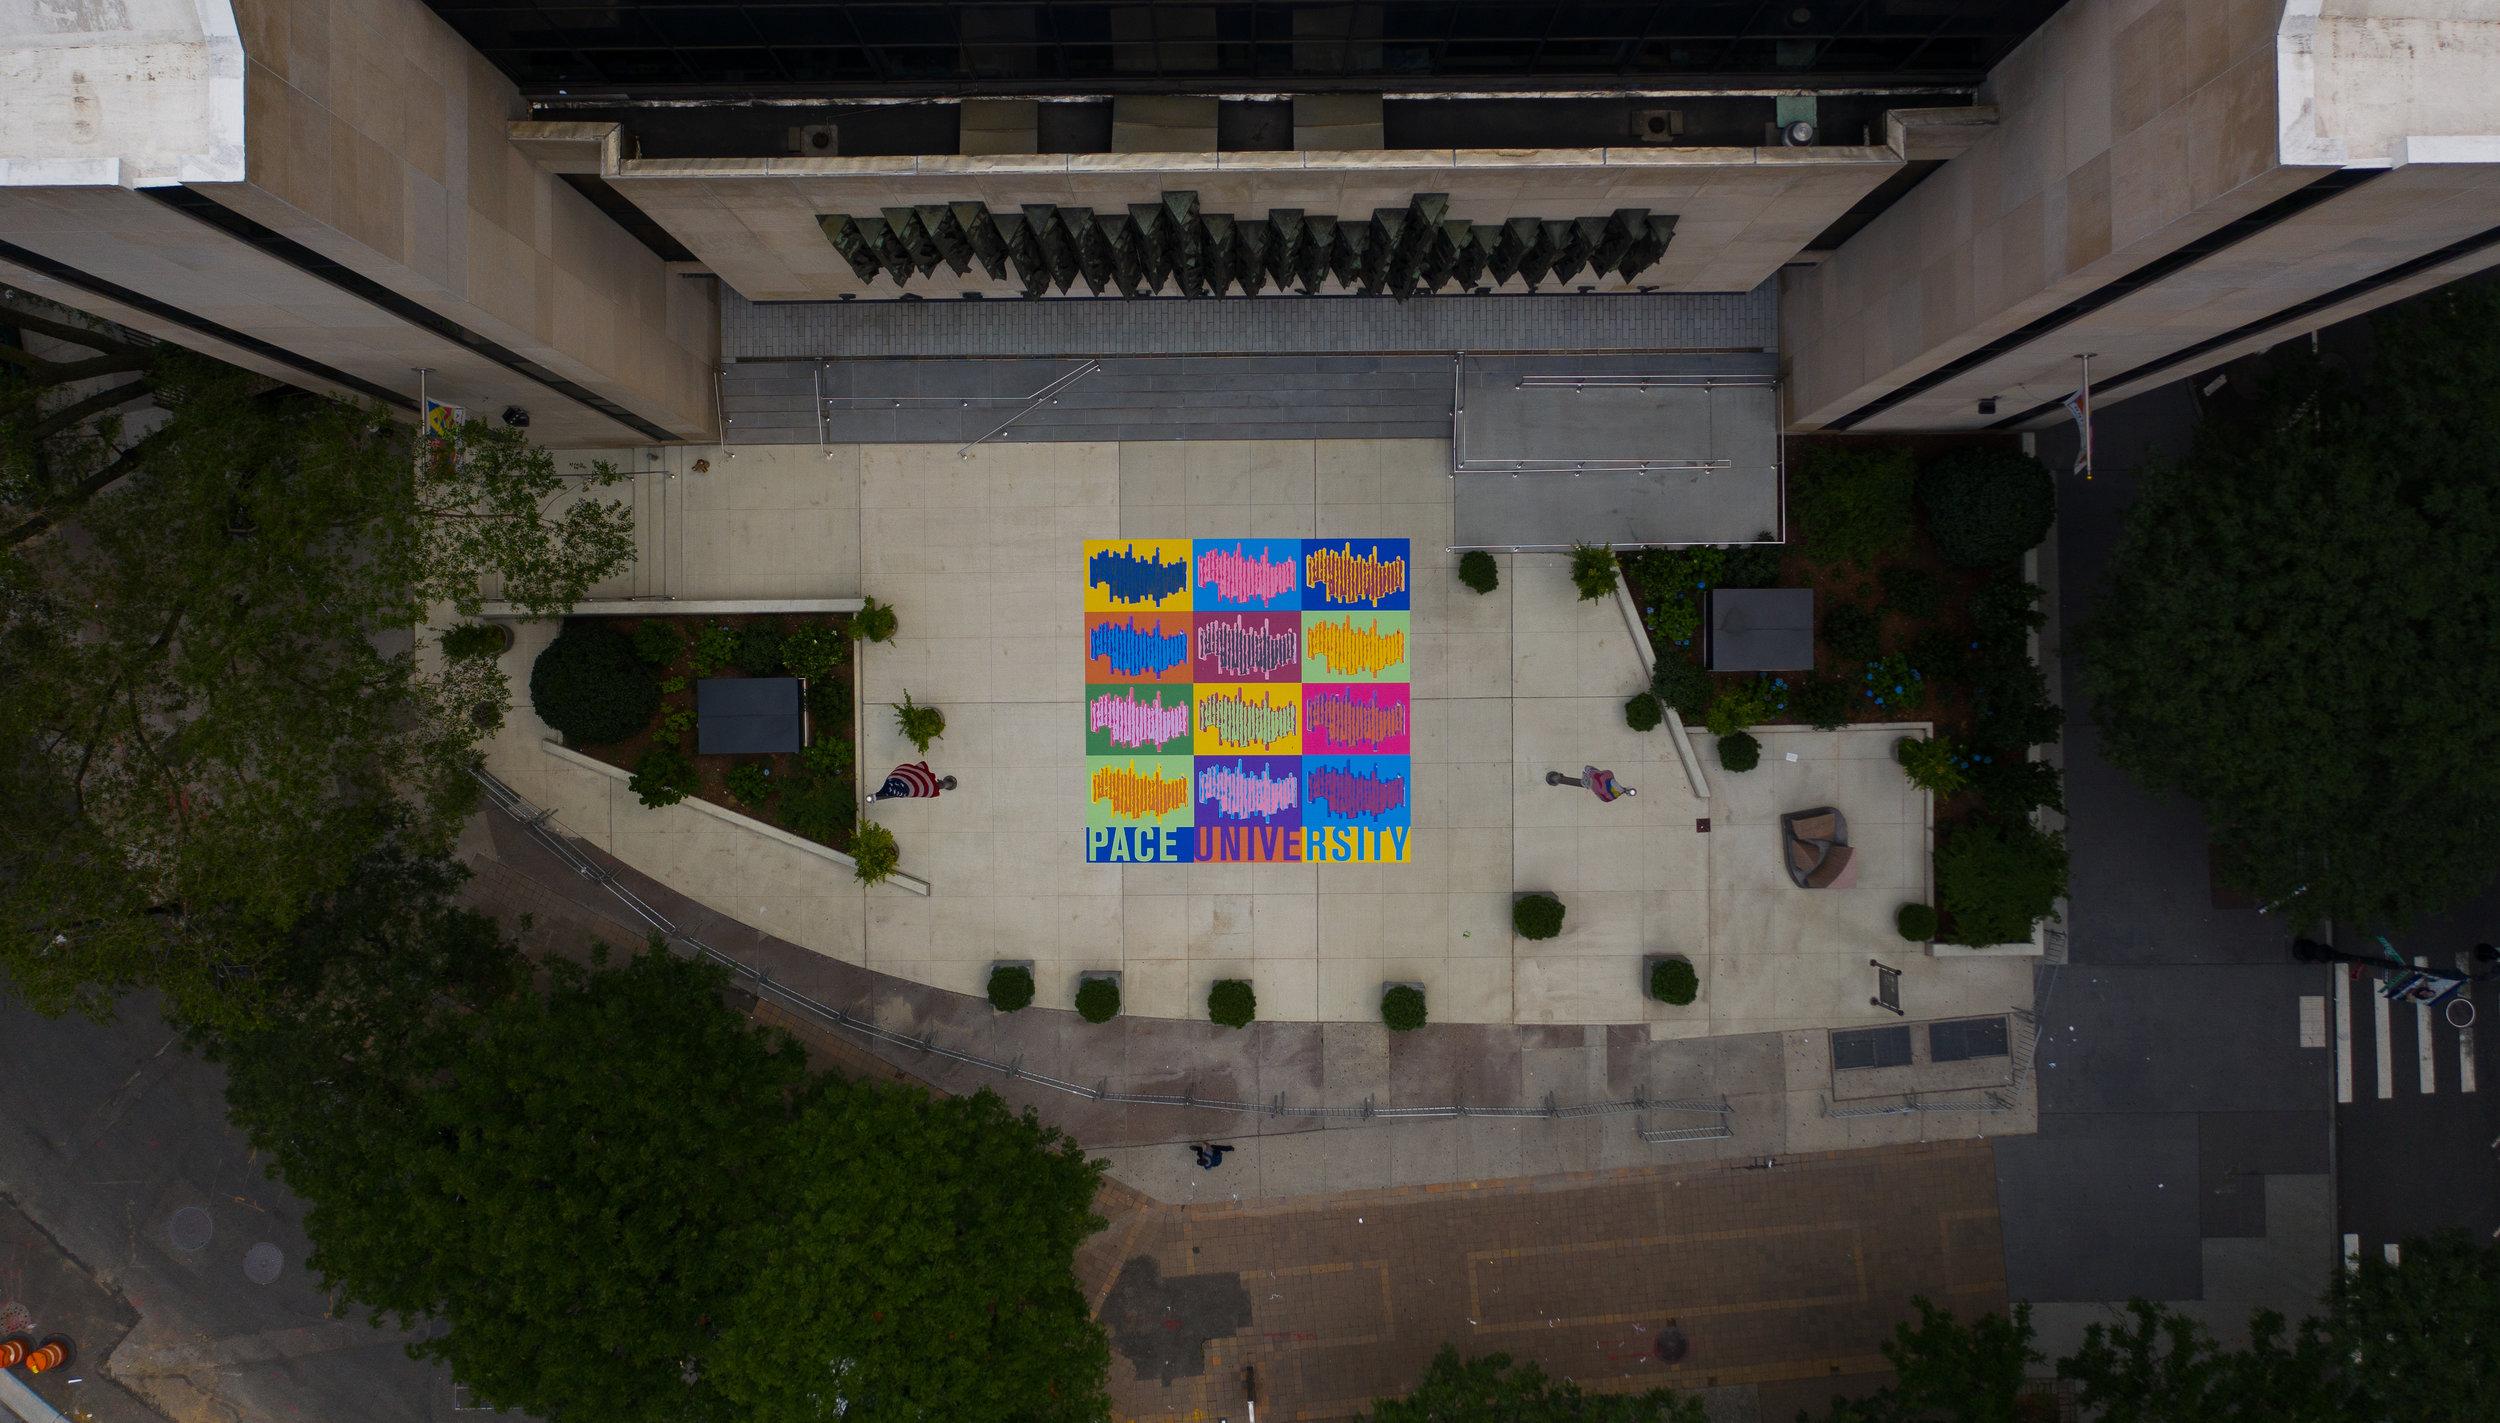 Pace University - 7/19/19